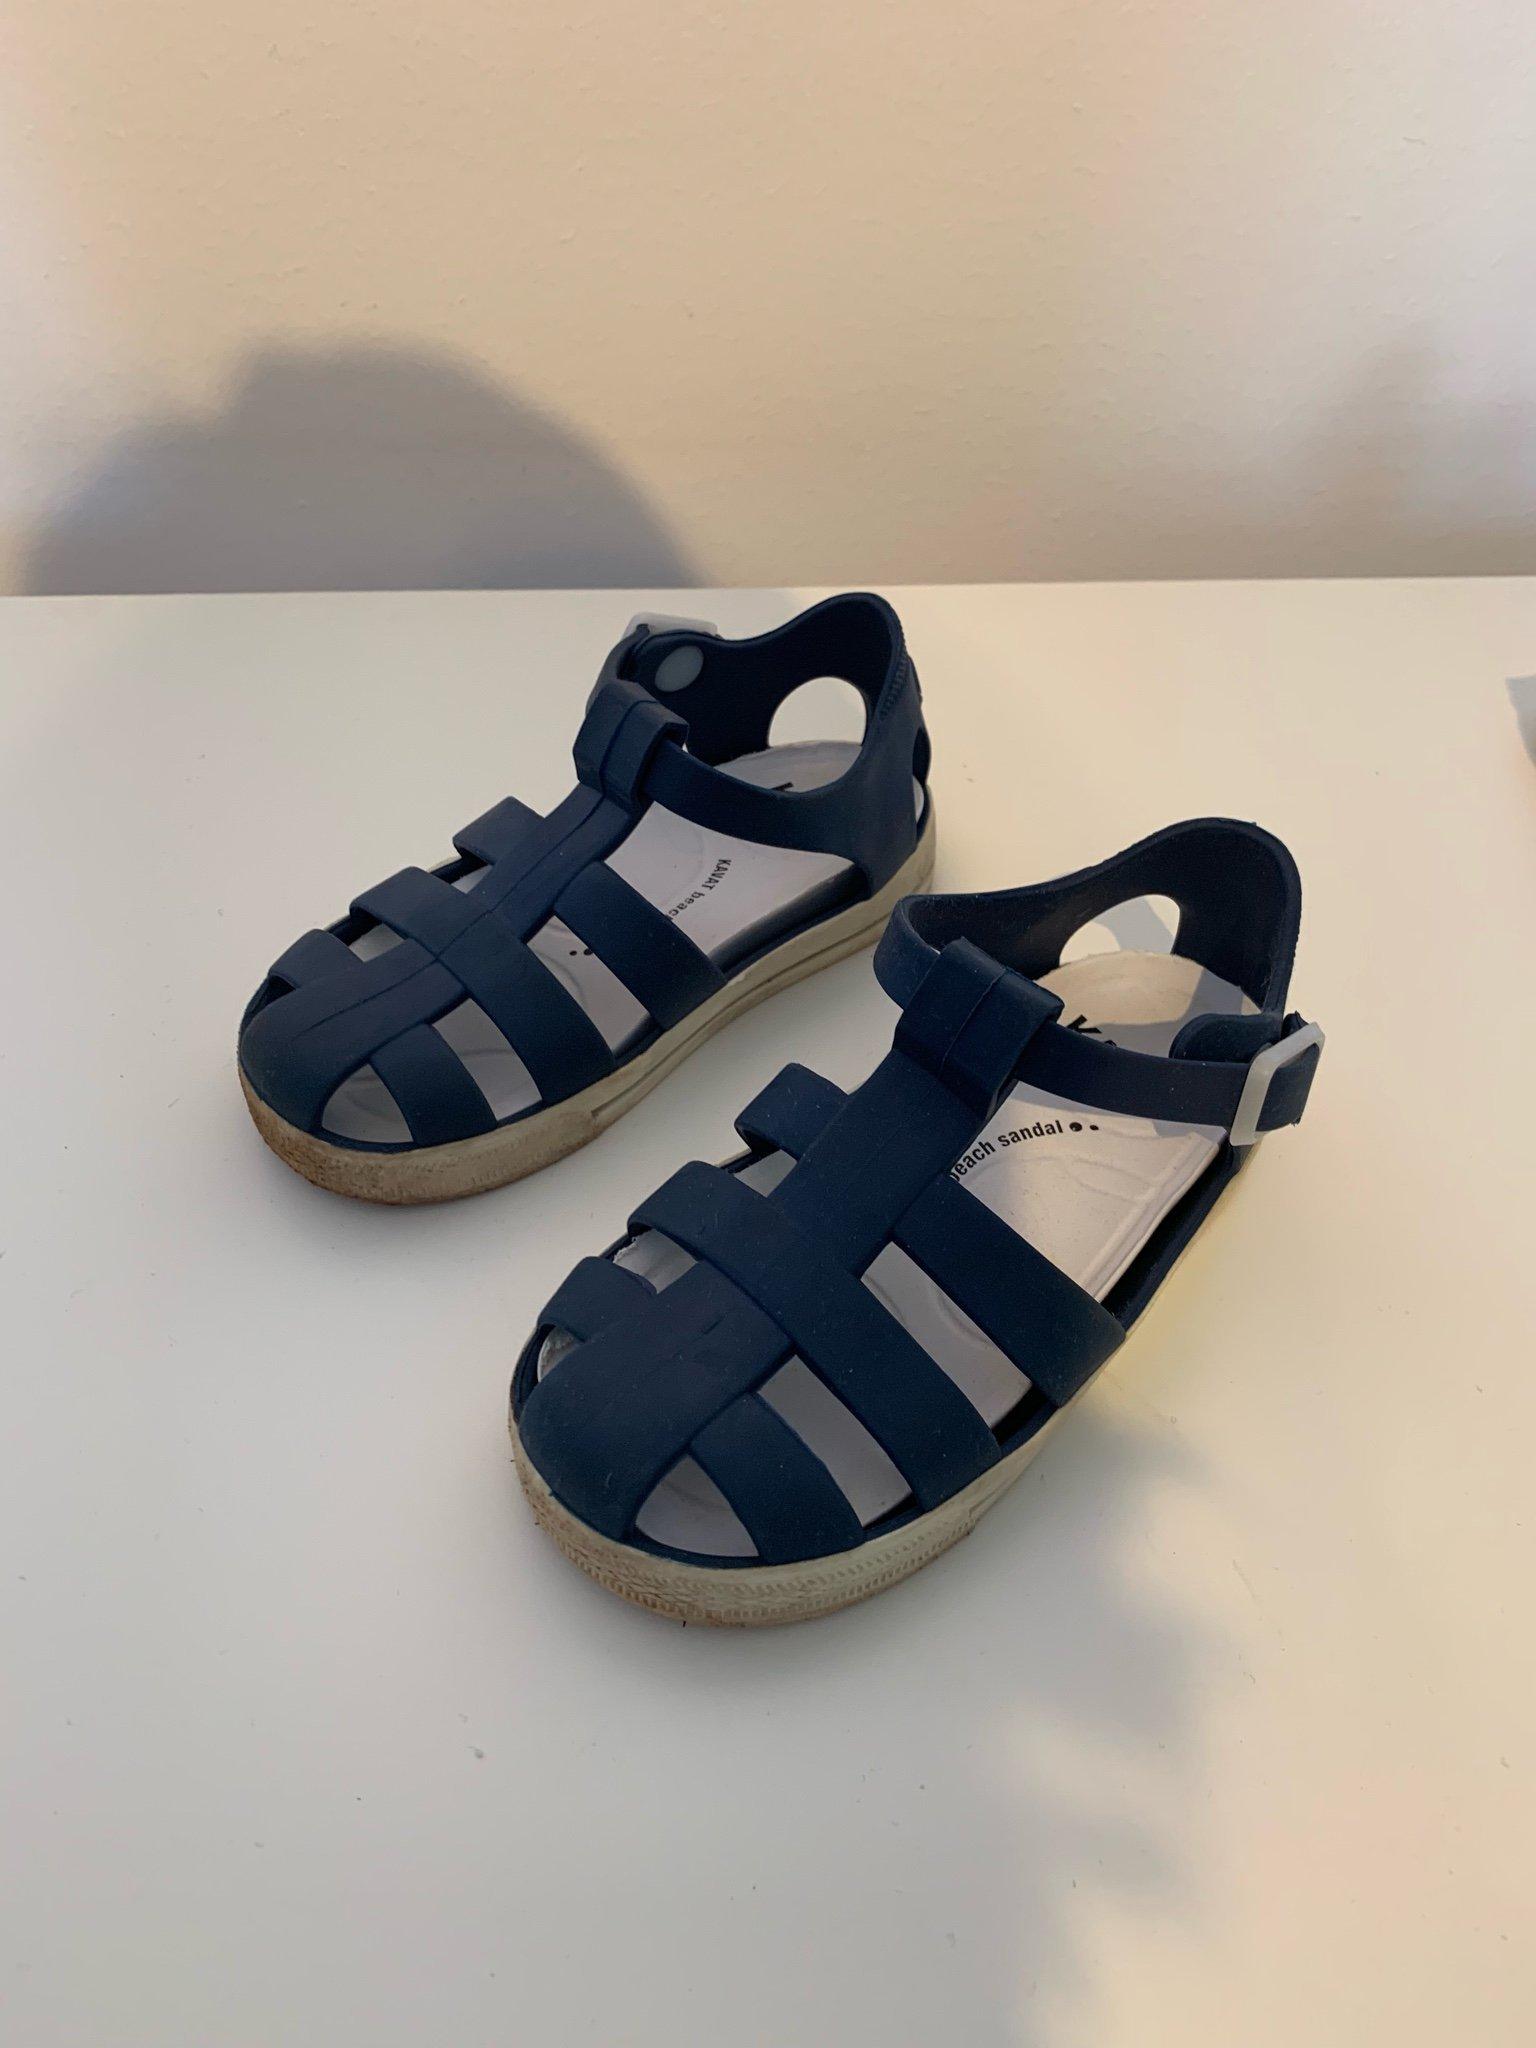 ec7e8c2edf46 Kavat sandal strl 23 24 (347241134) ᐈ Köp på Tradera